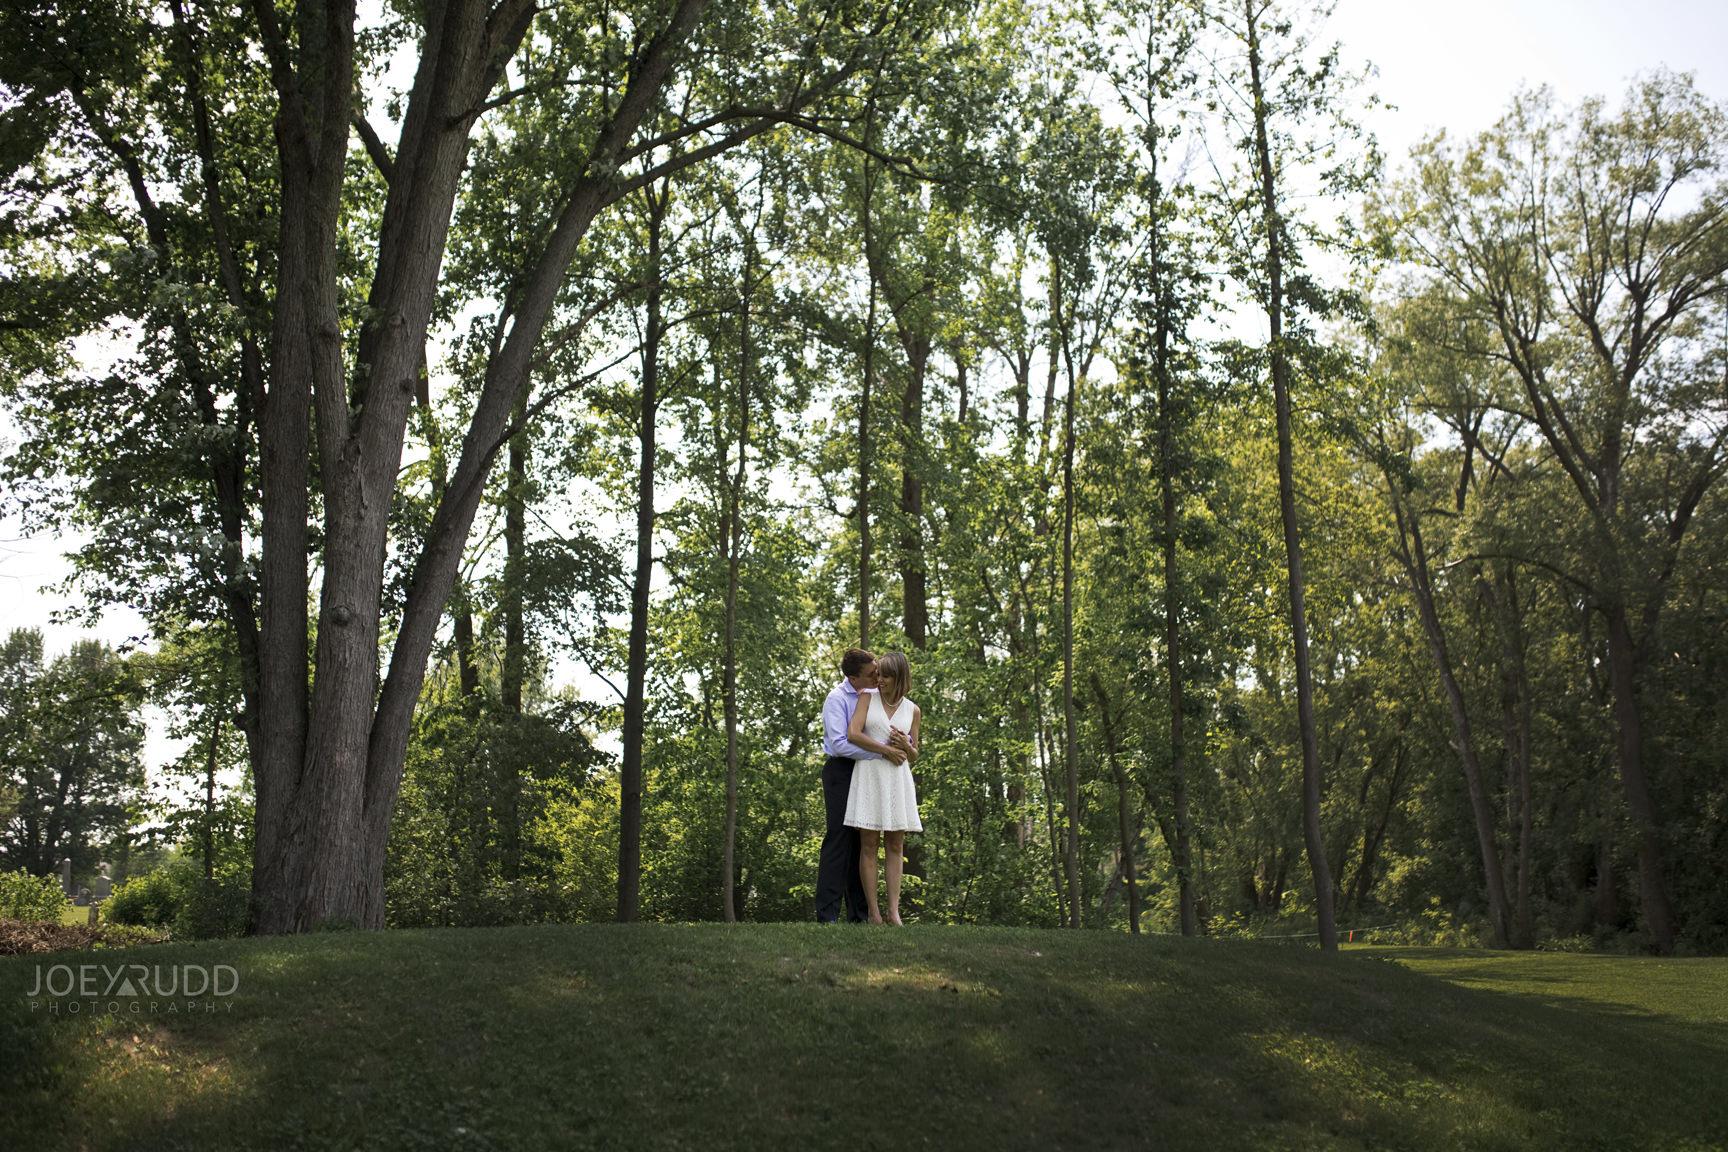 Elopement Wedding Ottawa Photographer Elope Photography Joey Rudd Photographer Trees